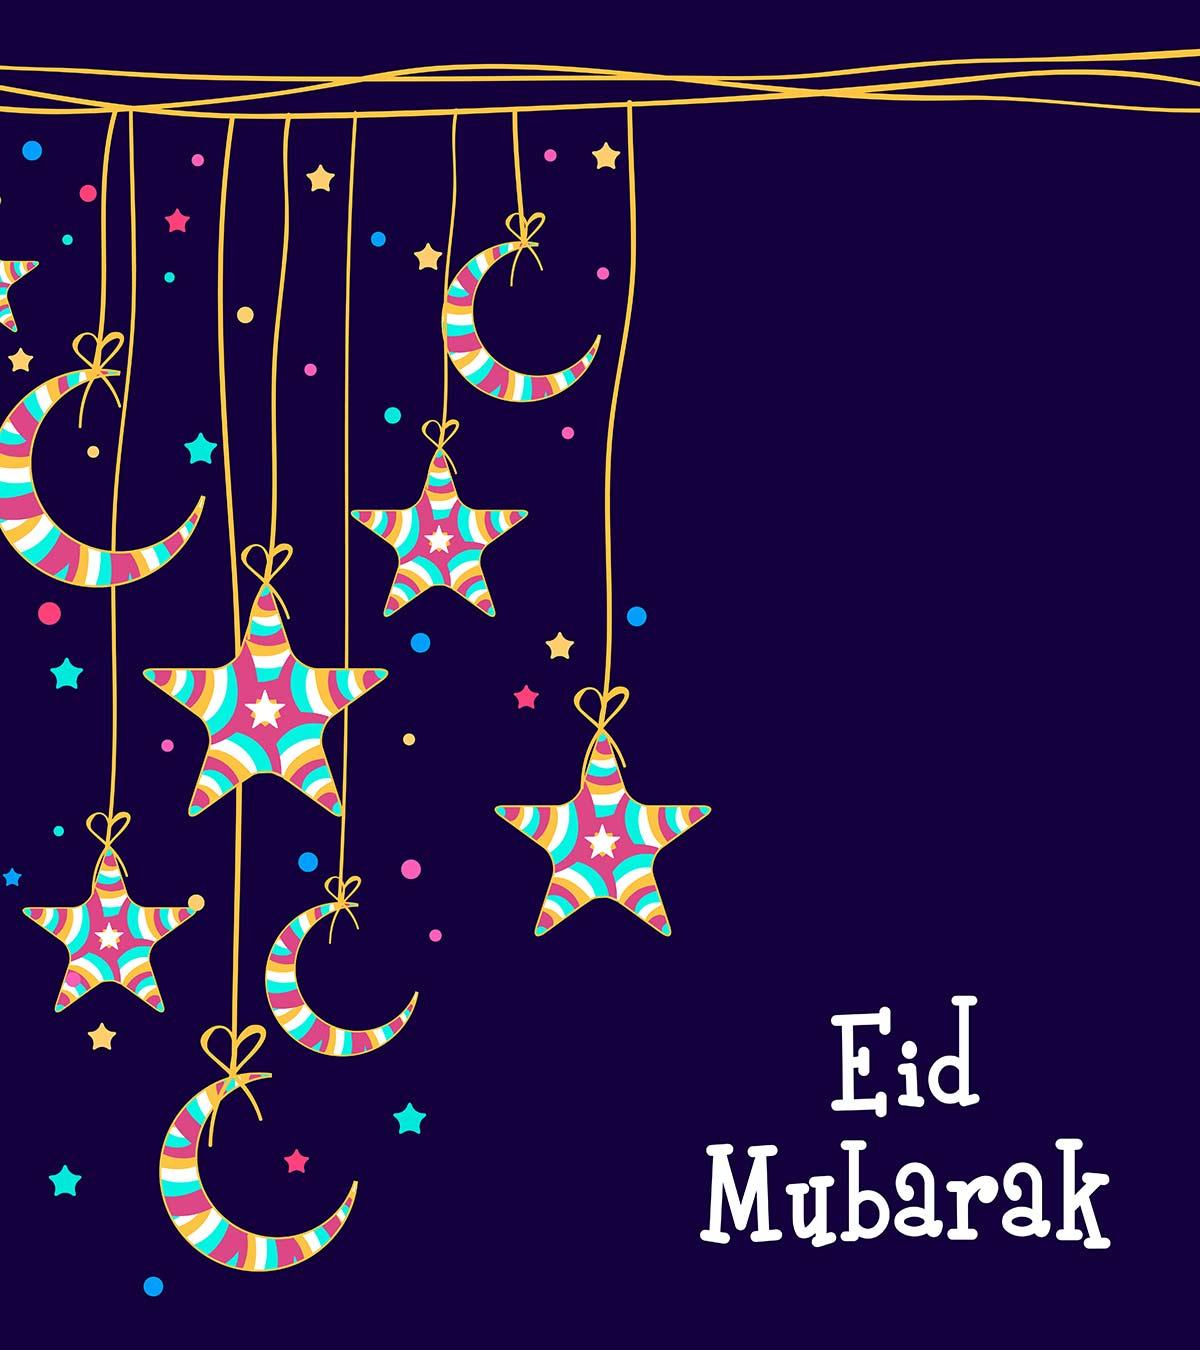 Eid Decoration Ideas For Office from cdn2.momjunction.com